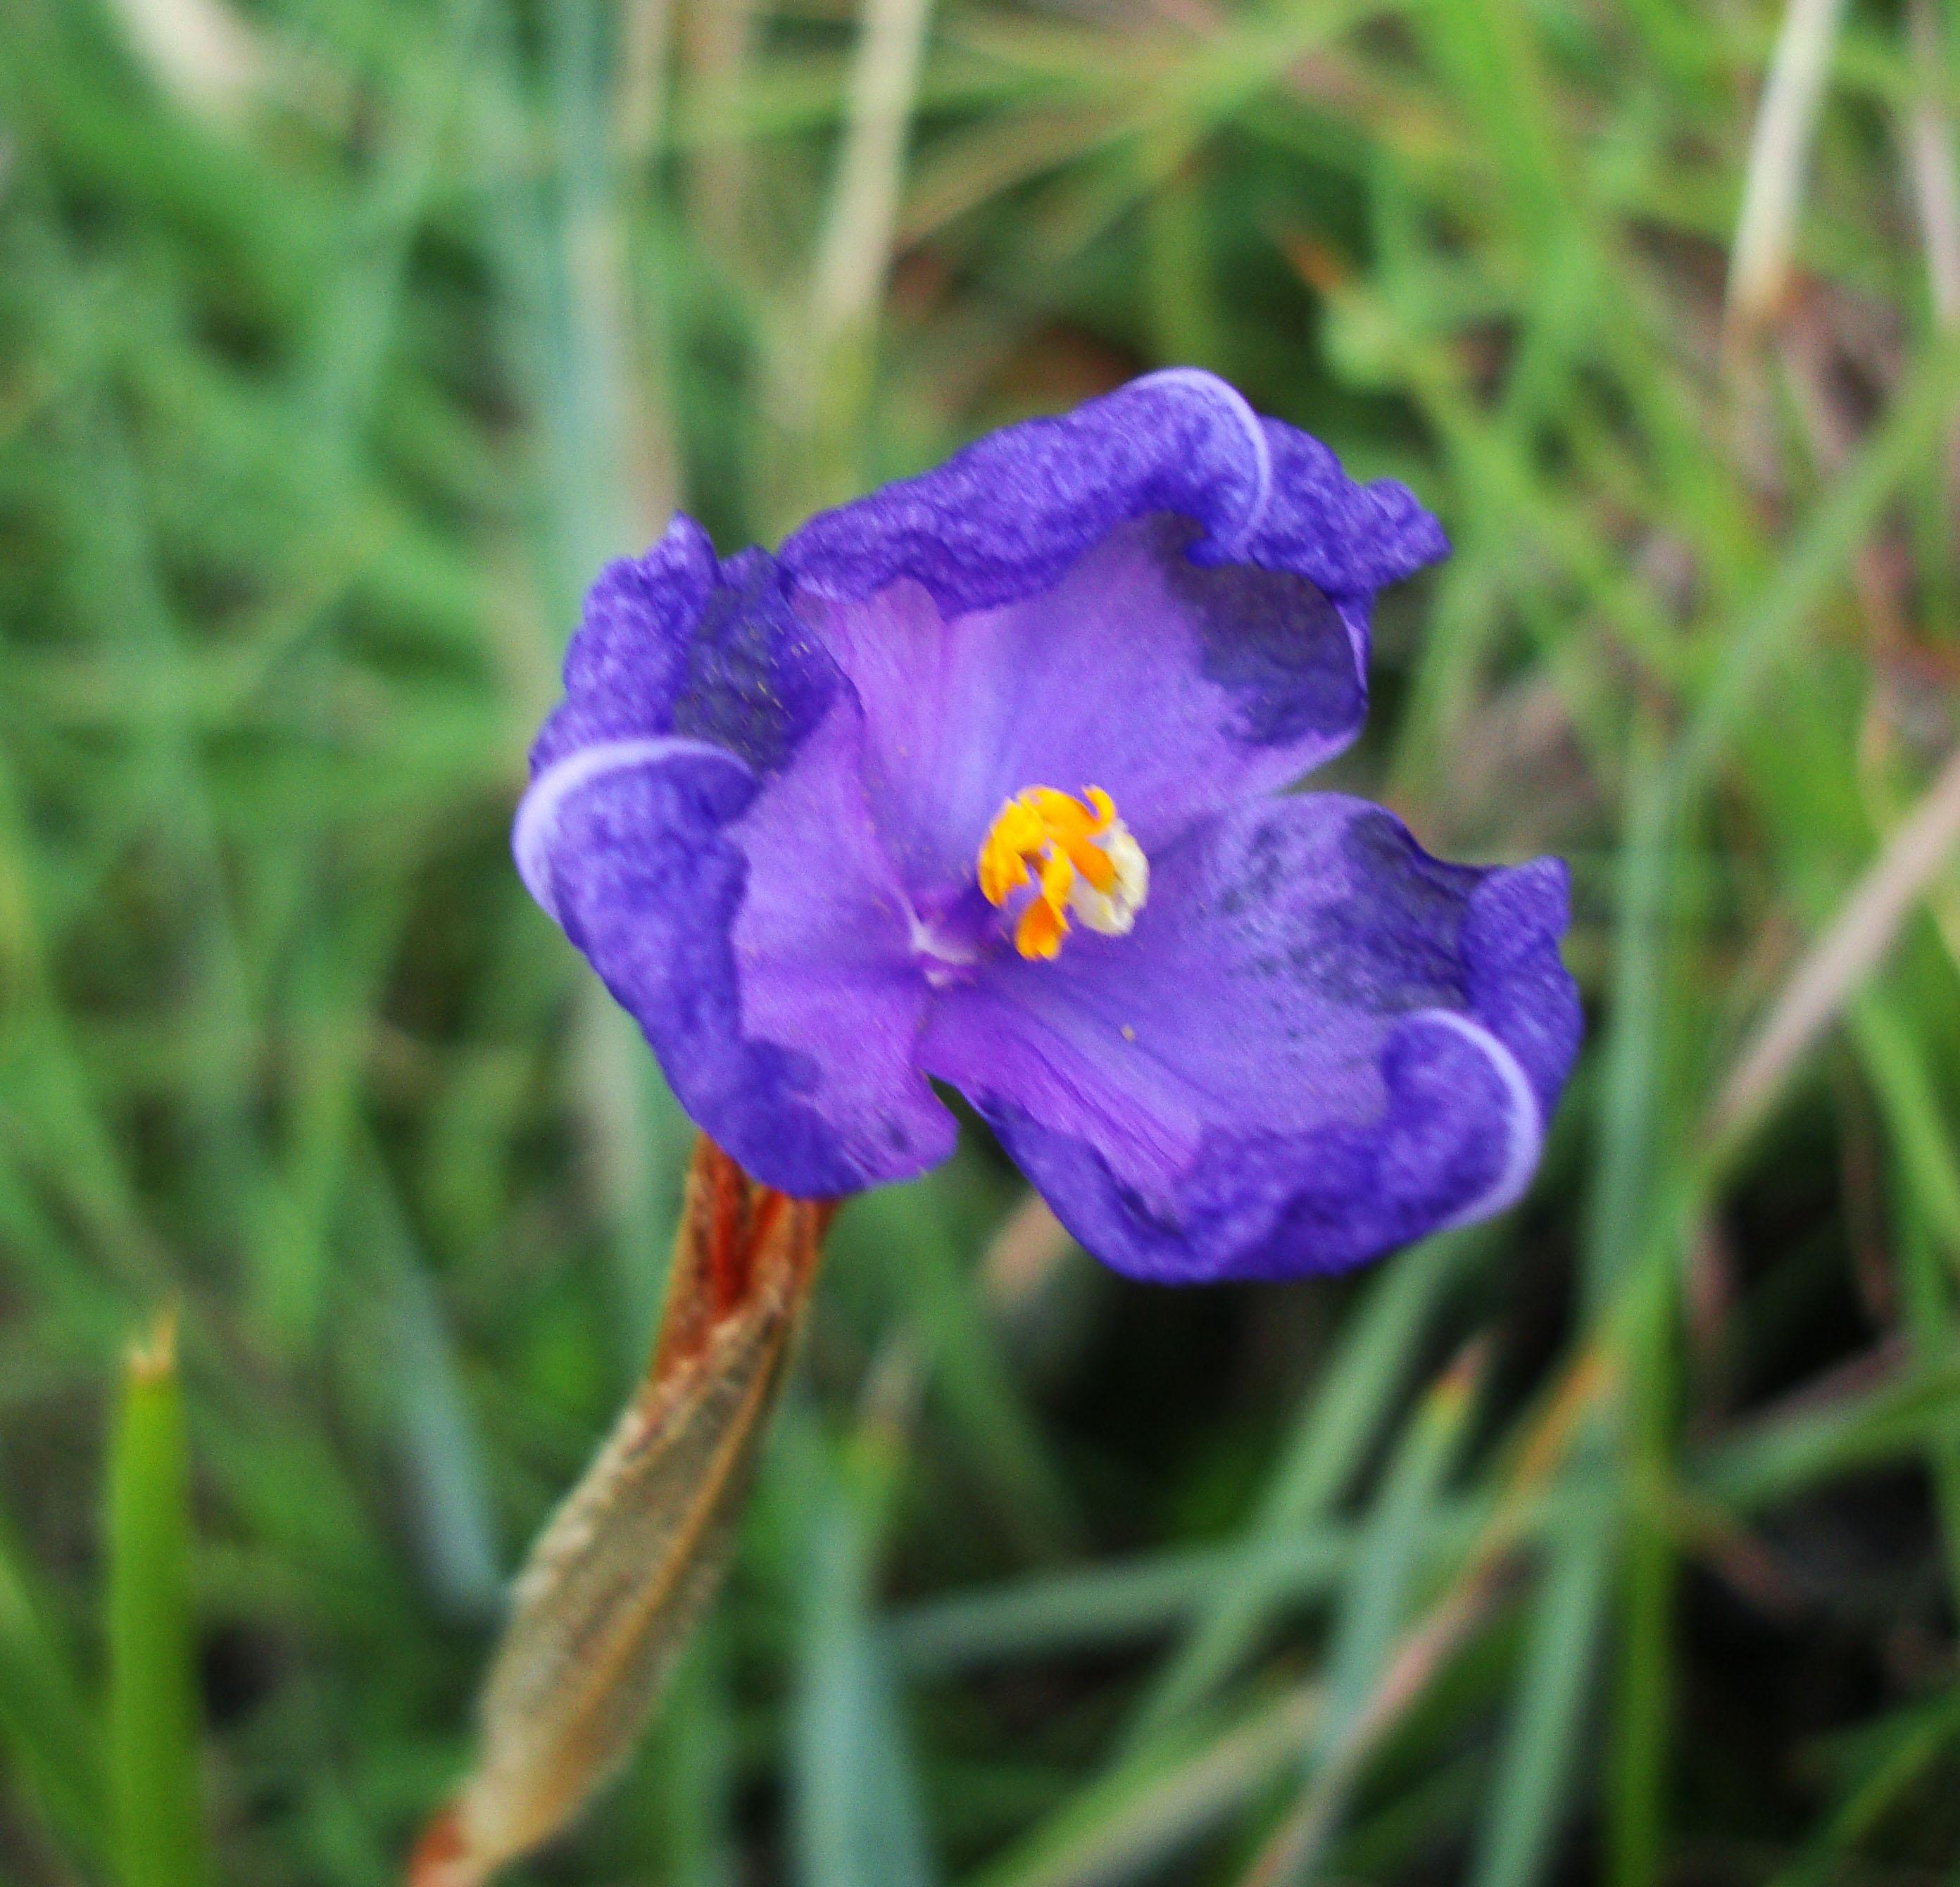 Tiny bush flowers Noosa National Park Qld Australia 12